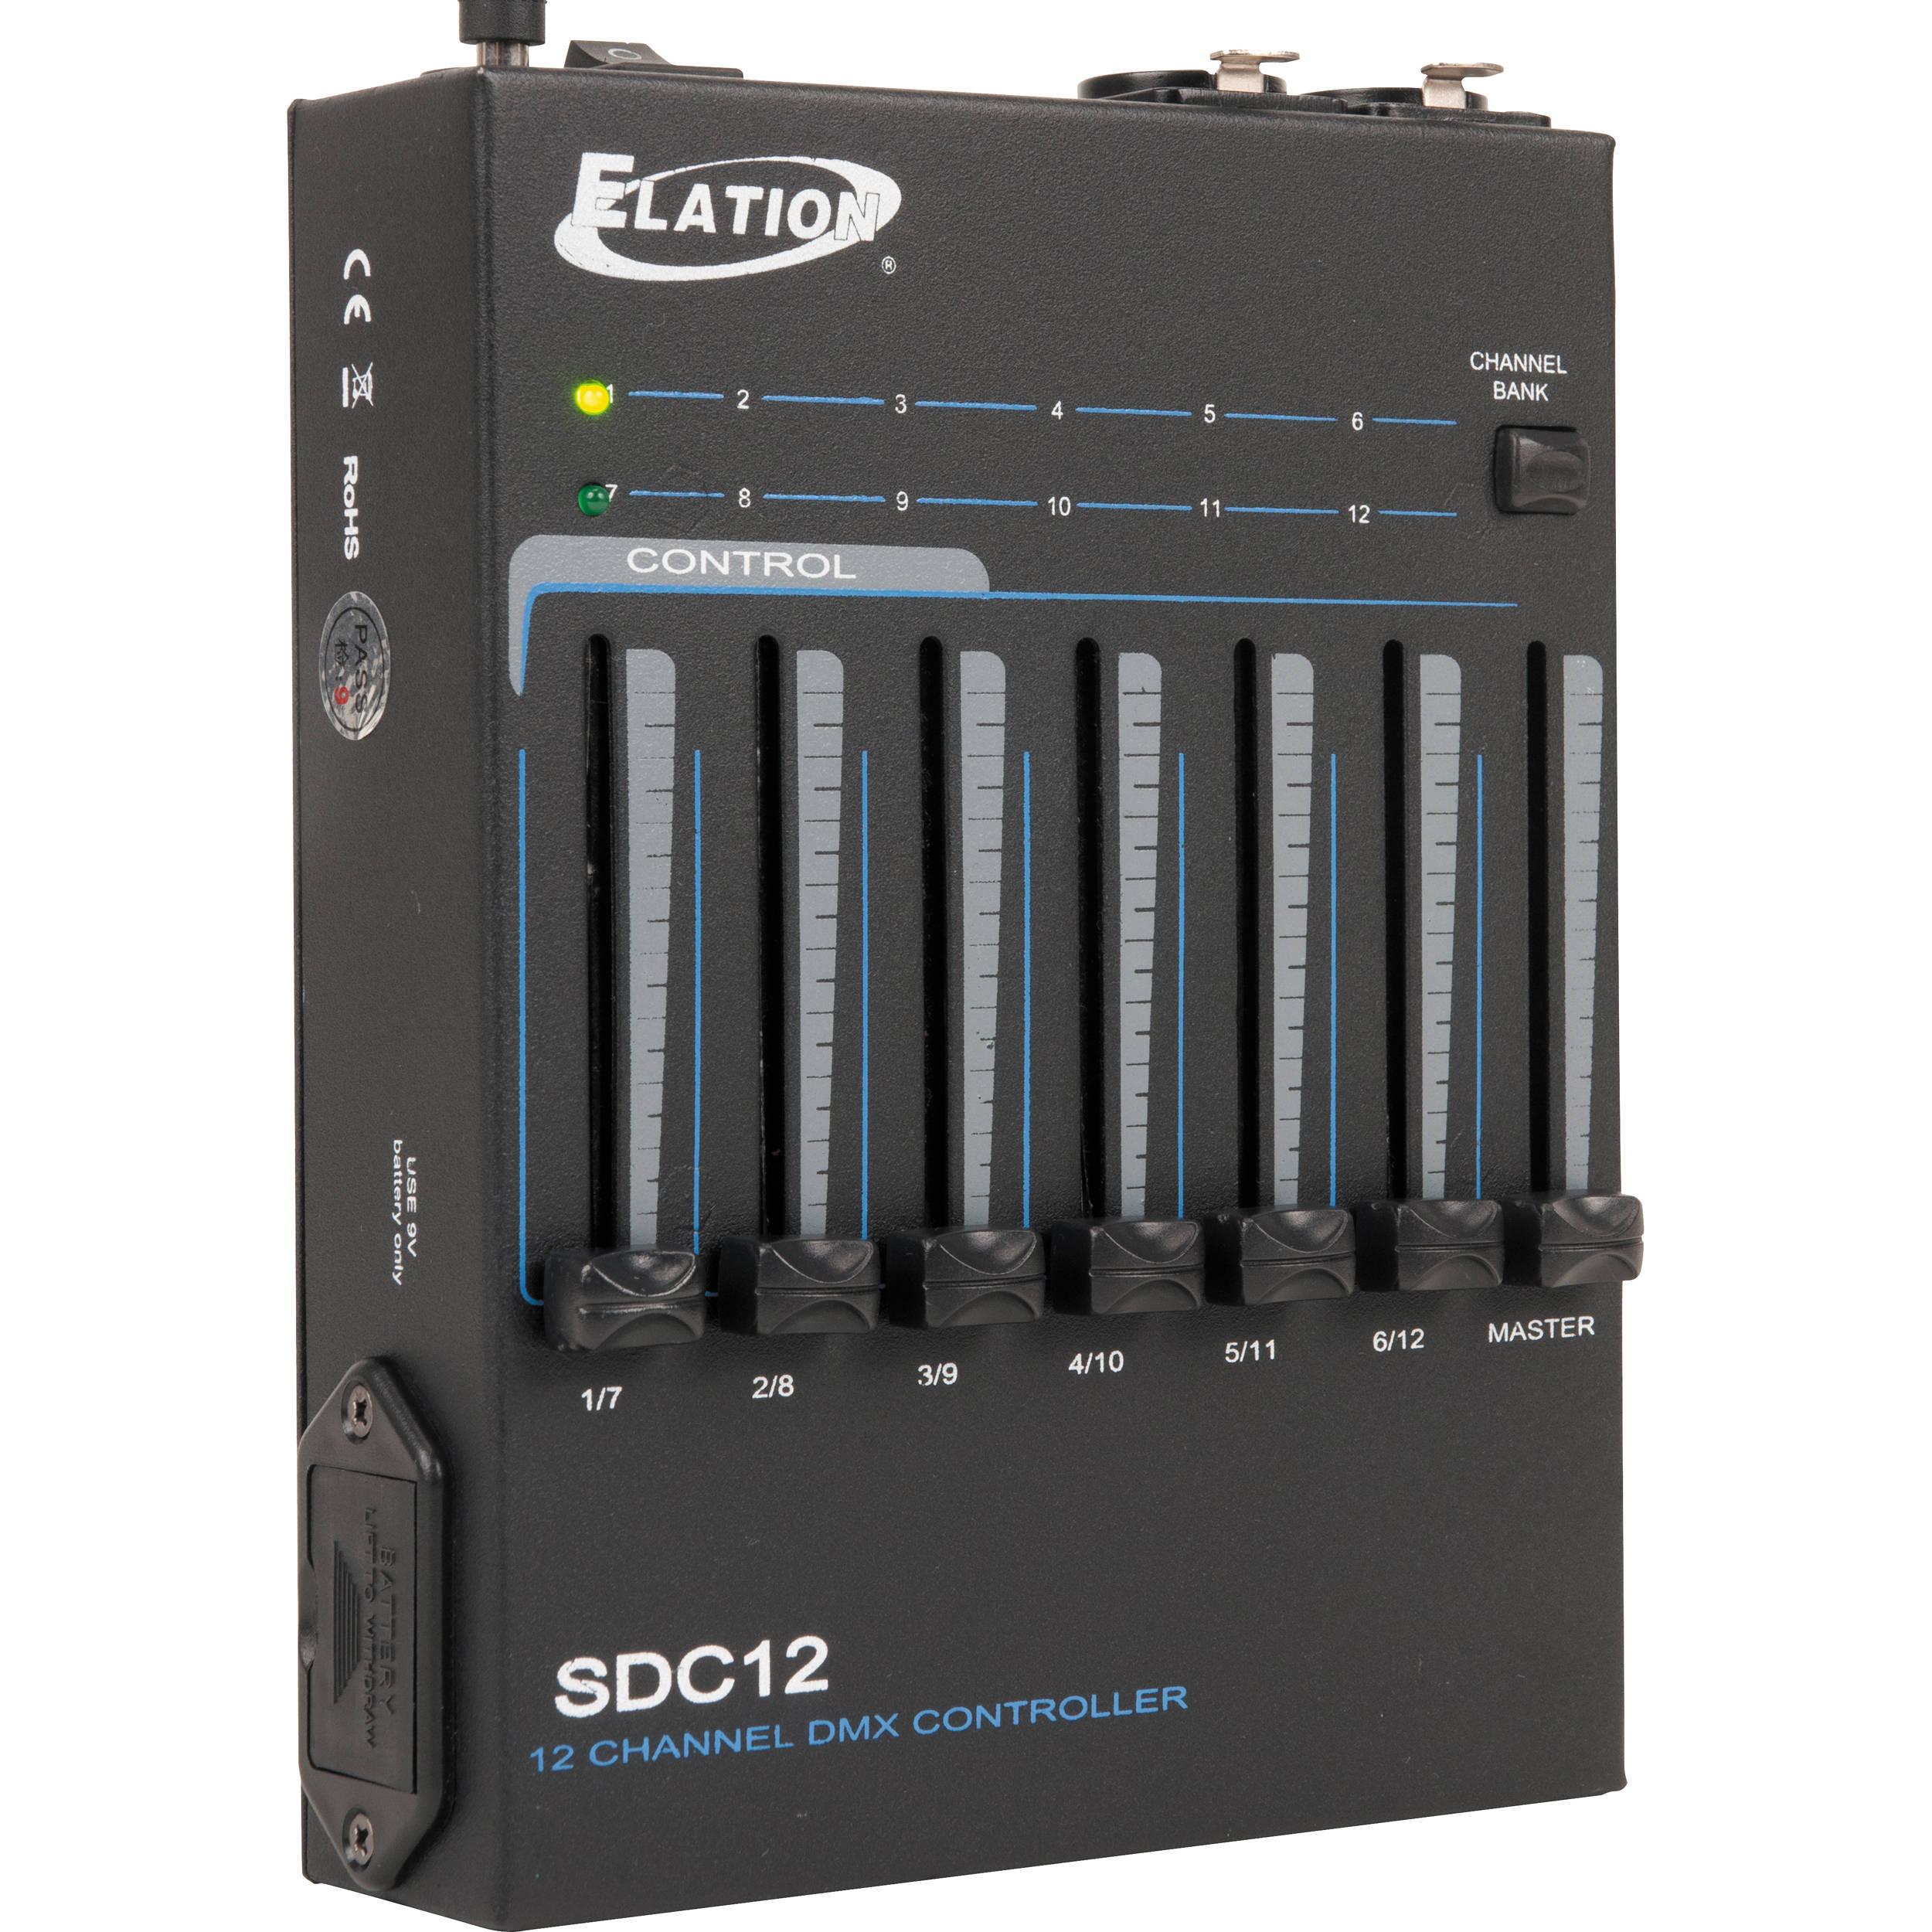 lighting consoles controllers b h photo video rh bhphotovideo com ETC Element Console Diagram Large Light Control Board